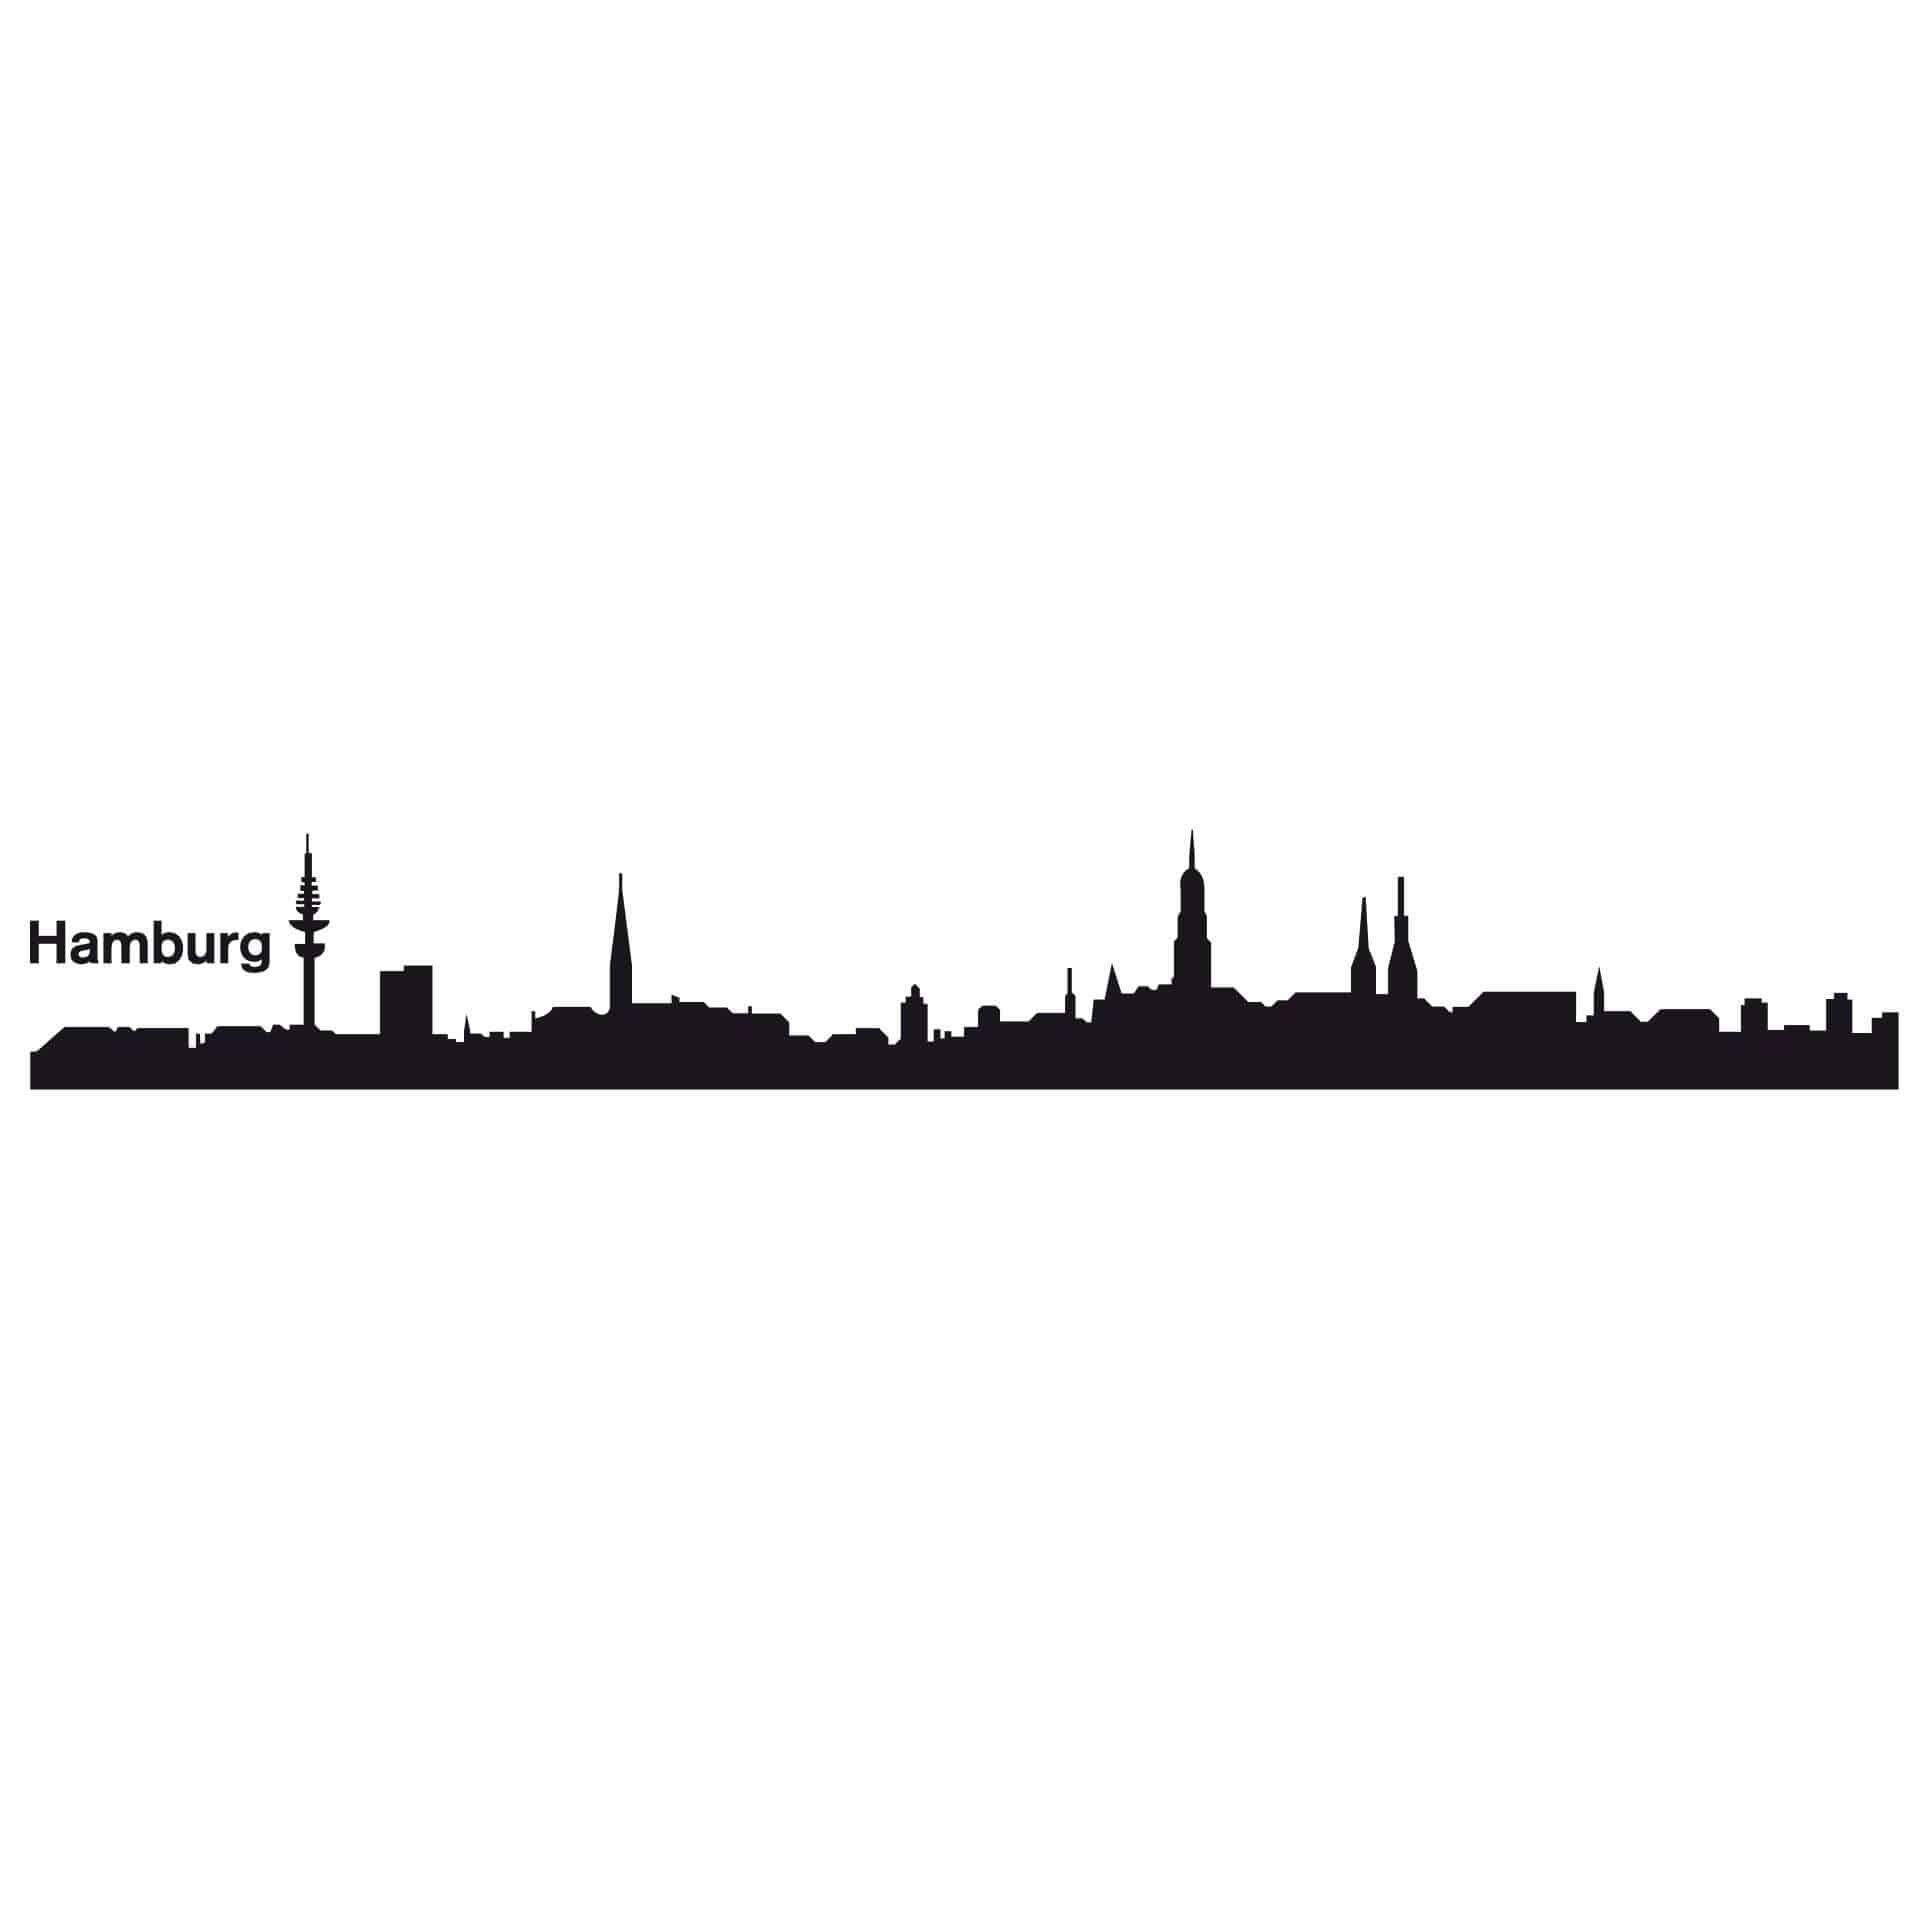 wandtattoo hamburg skyline wandbild wanddeko wandschmuck. Black Bedroom Furniture Sets. Home Design Ideas